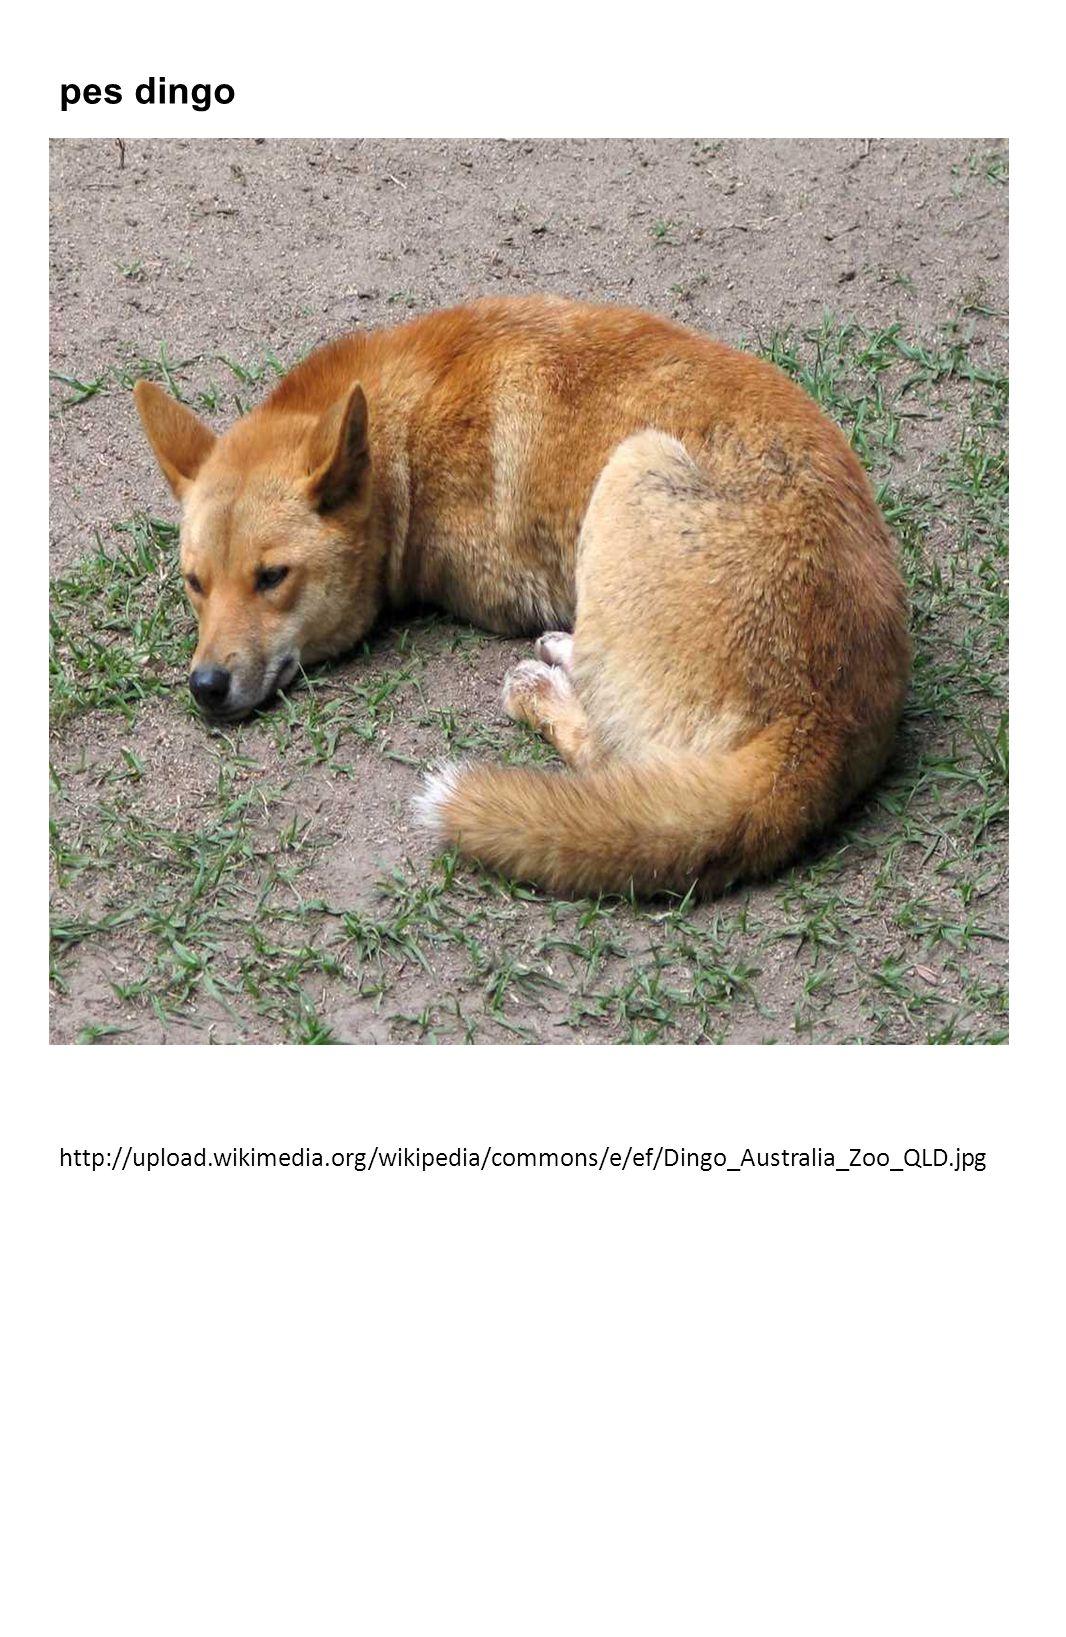 pes dingo http://upload.wikimedia.org/wikipedia/commons/e/ef/Dingo_Australia_Zoo_QLD.jpg